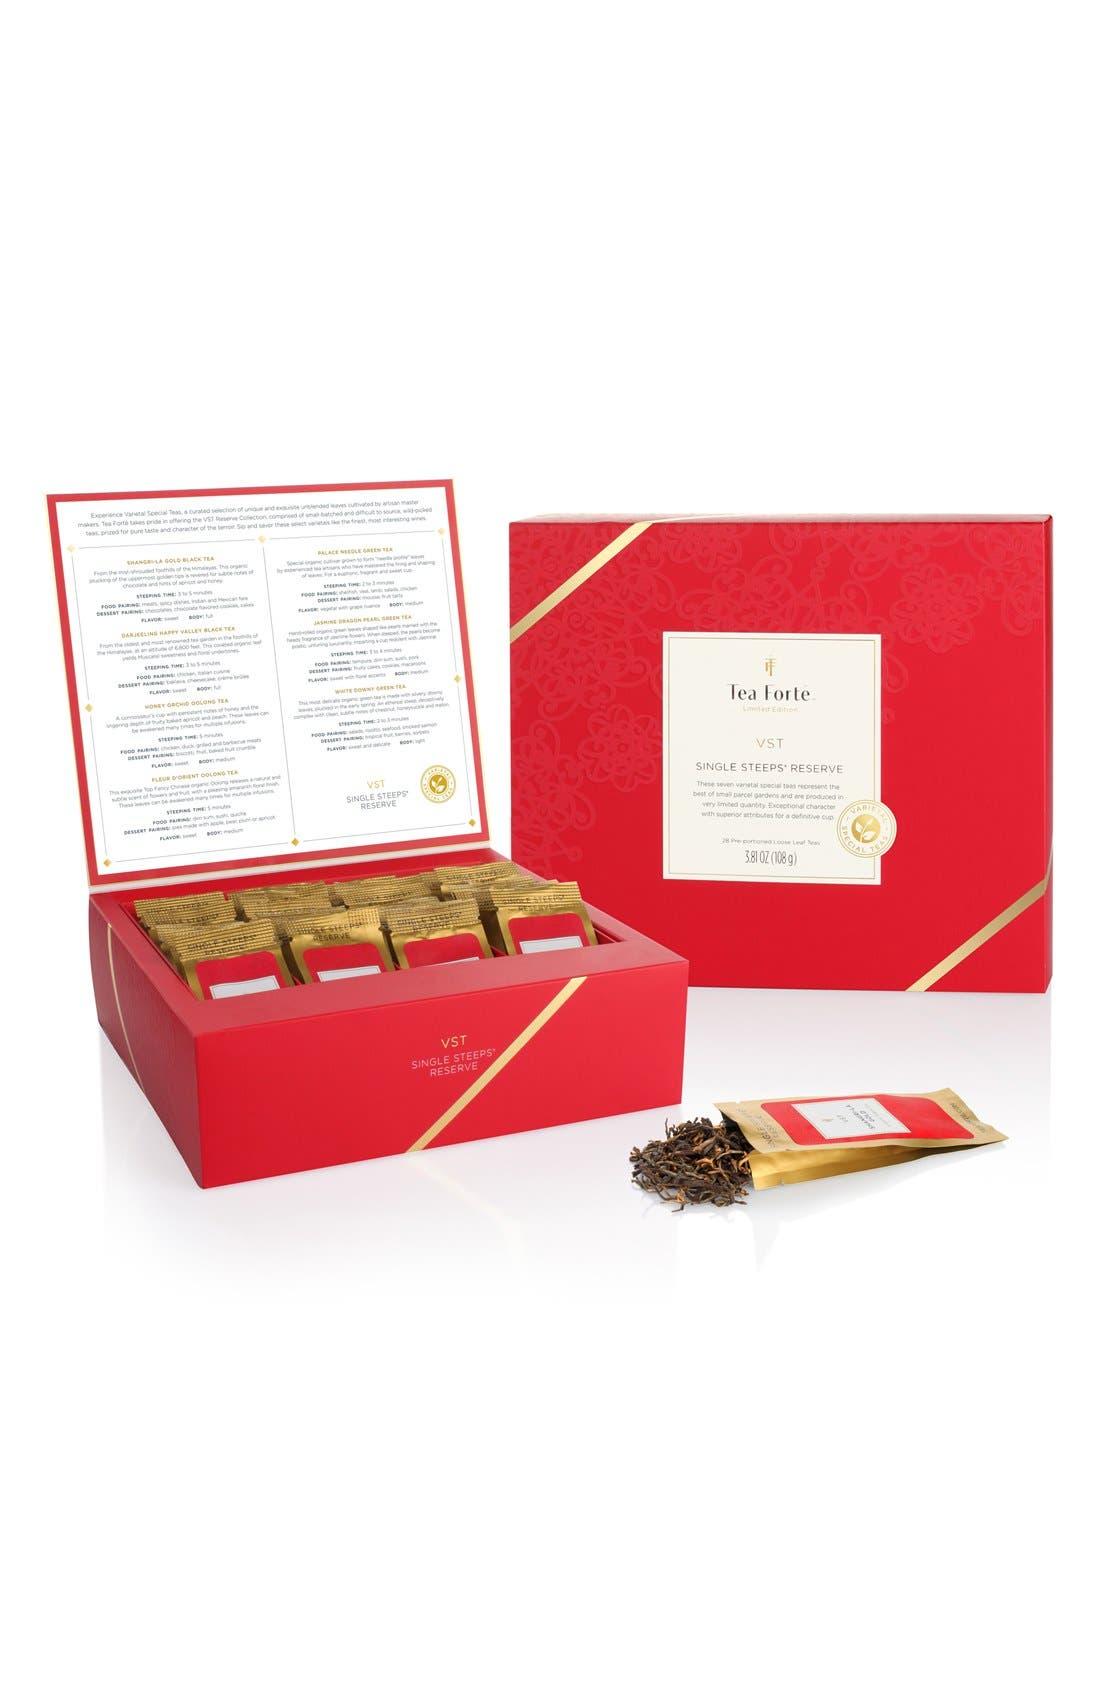 Tea Forté 'VST - Single Steeps Reserve' Loose Tea Chest